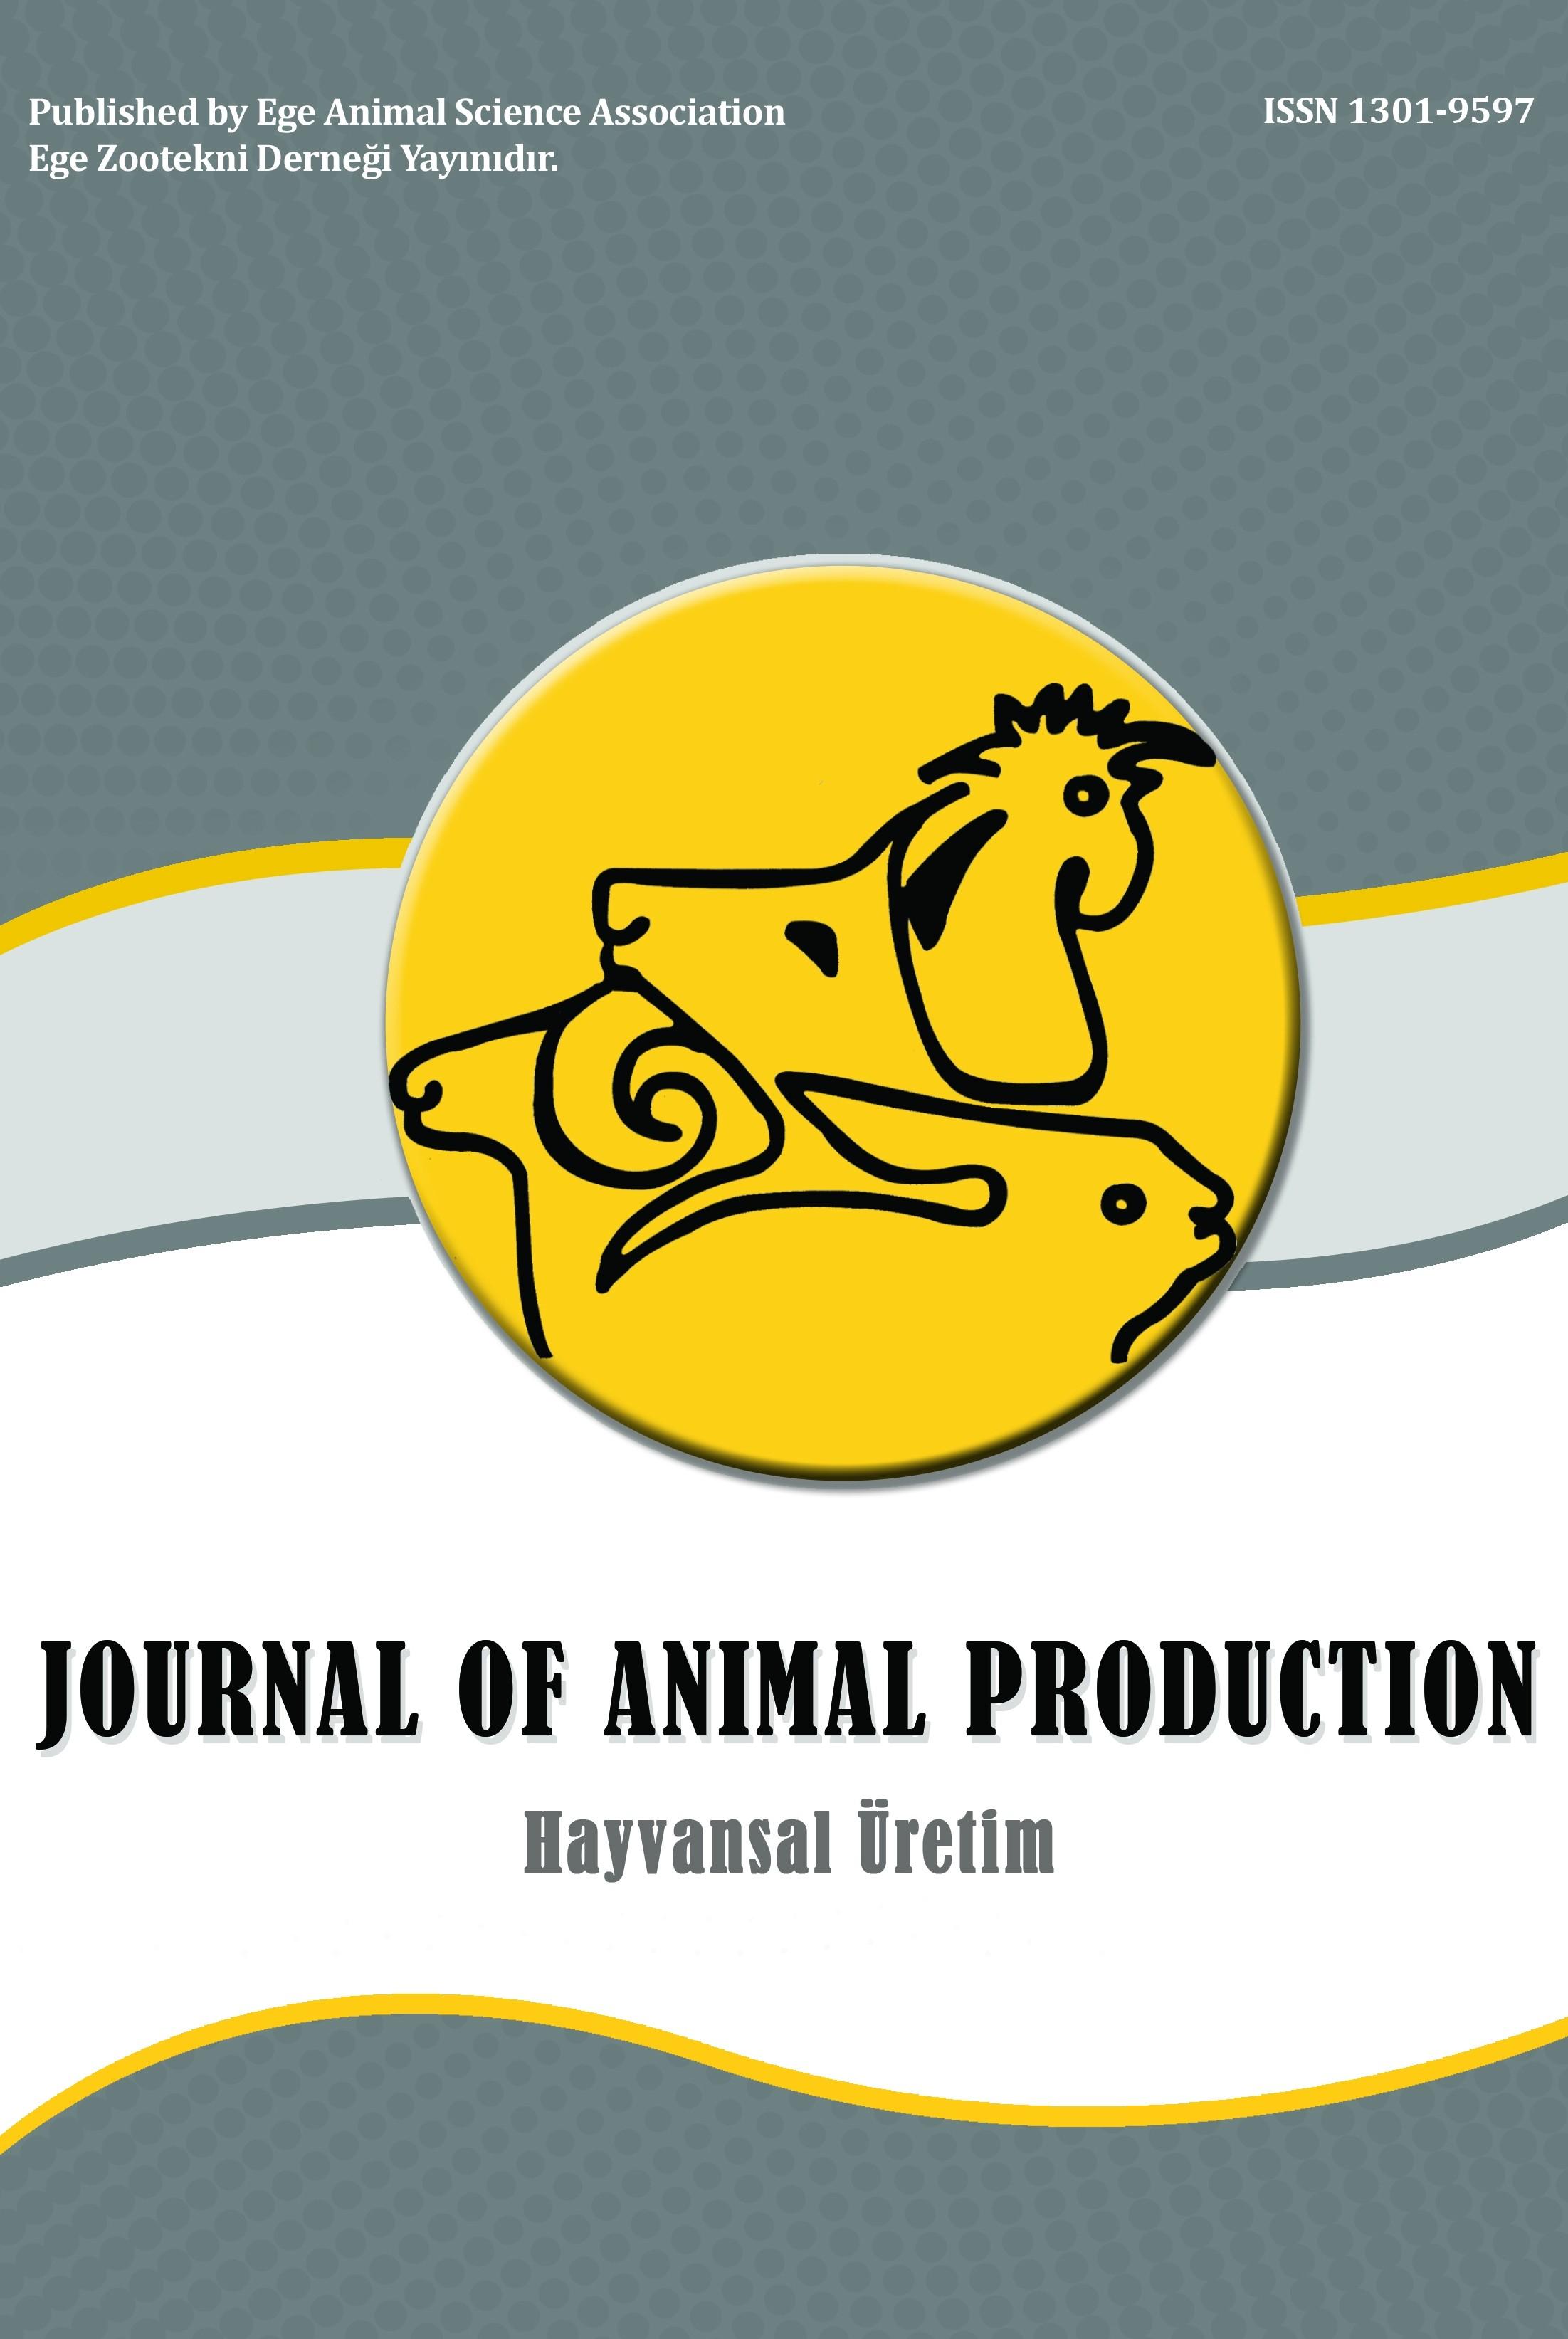 Hayvansal Üretim